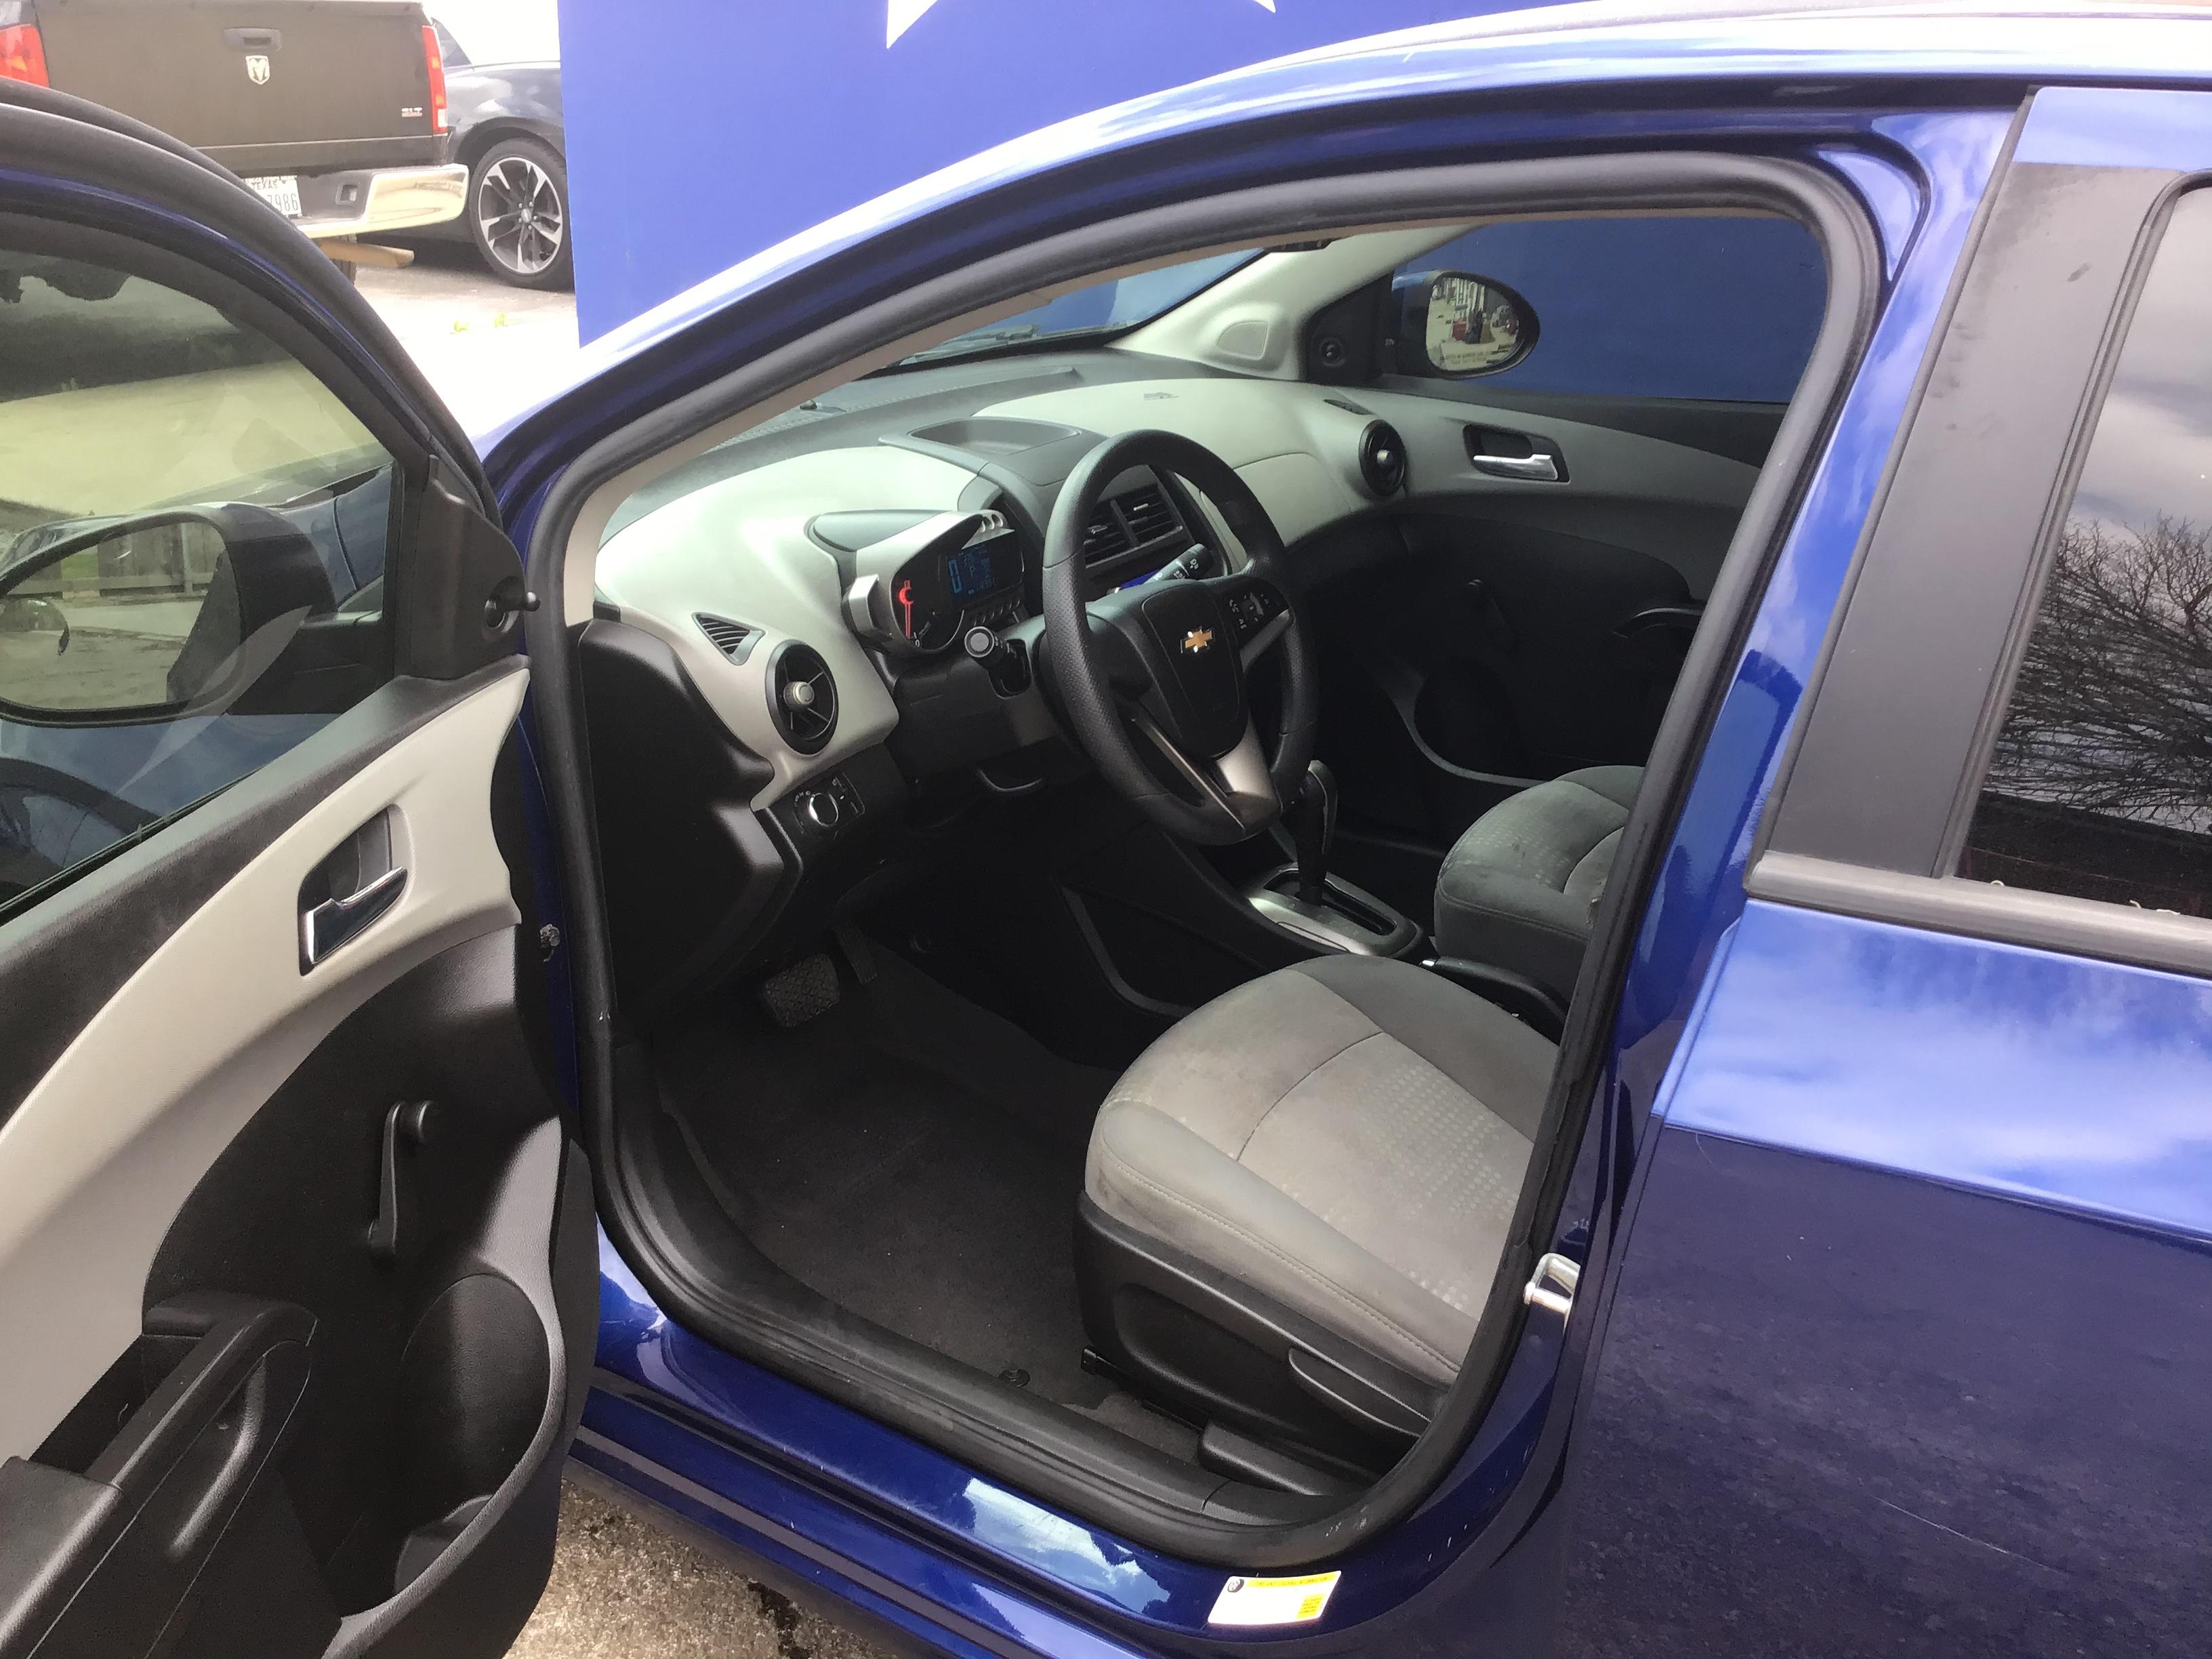 used vehicle - Sedan CHEVROLET SONIC 2013